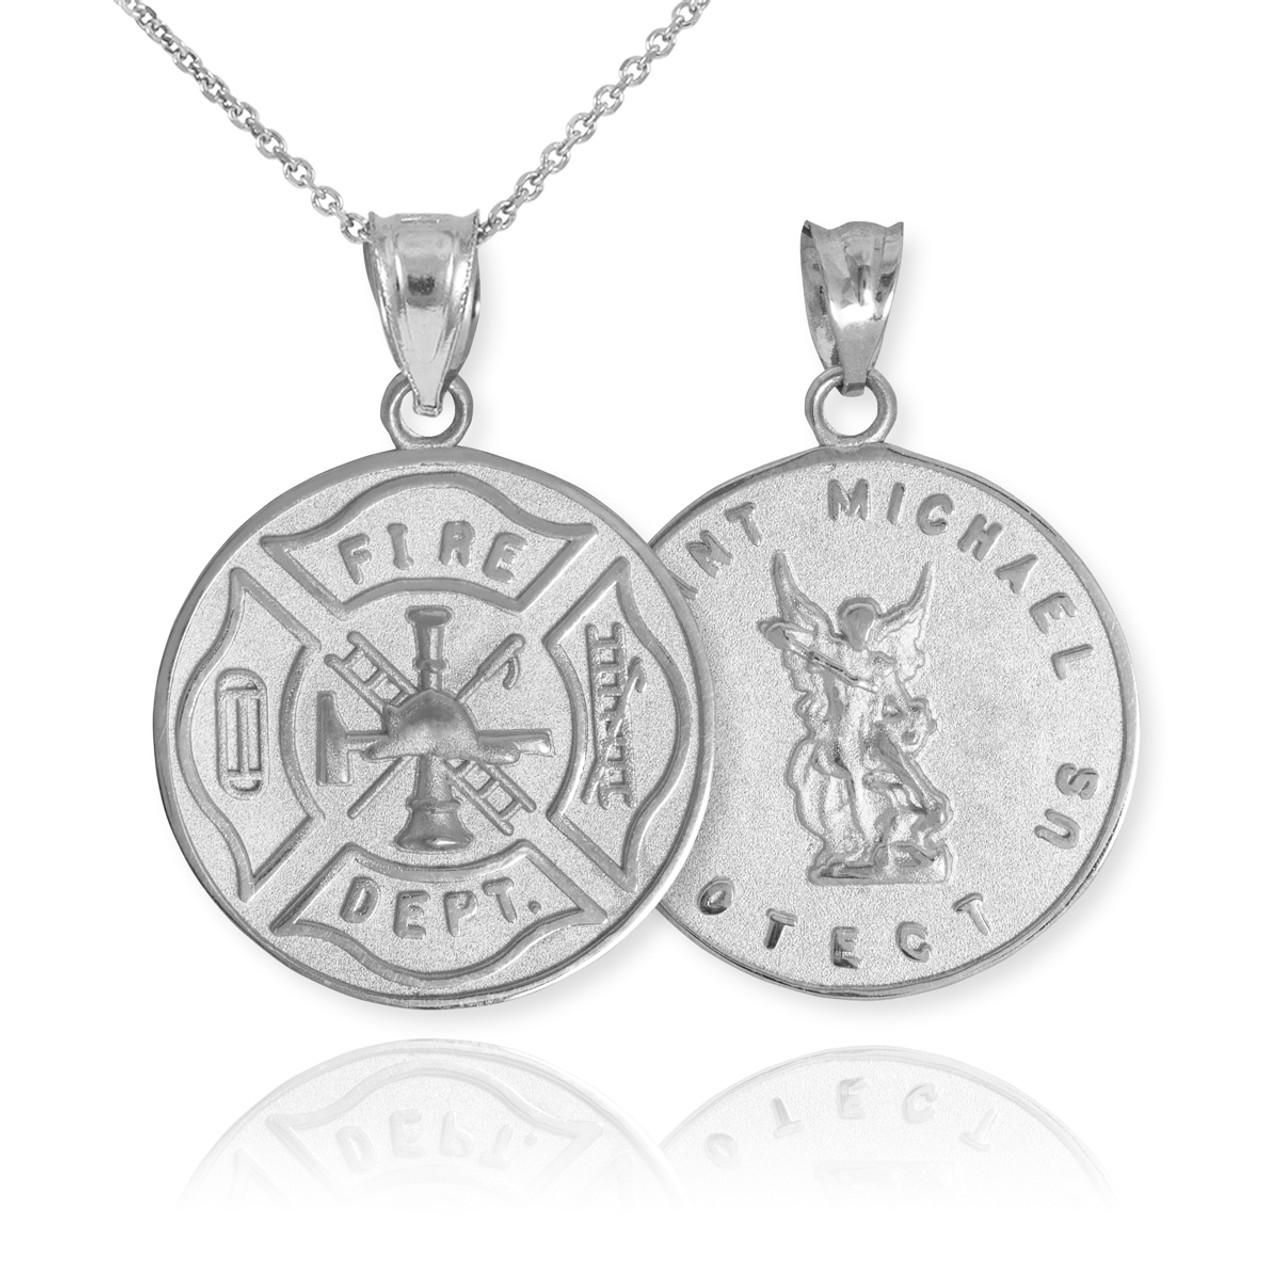 White gold firefighter badge reversible st michael pendant necklace white gold firefighter badge reversible st michael pendant necklace aloadofball Gallery